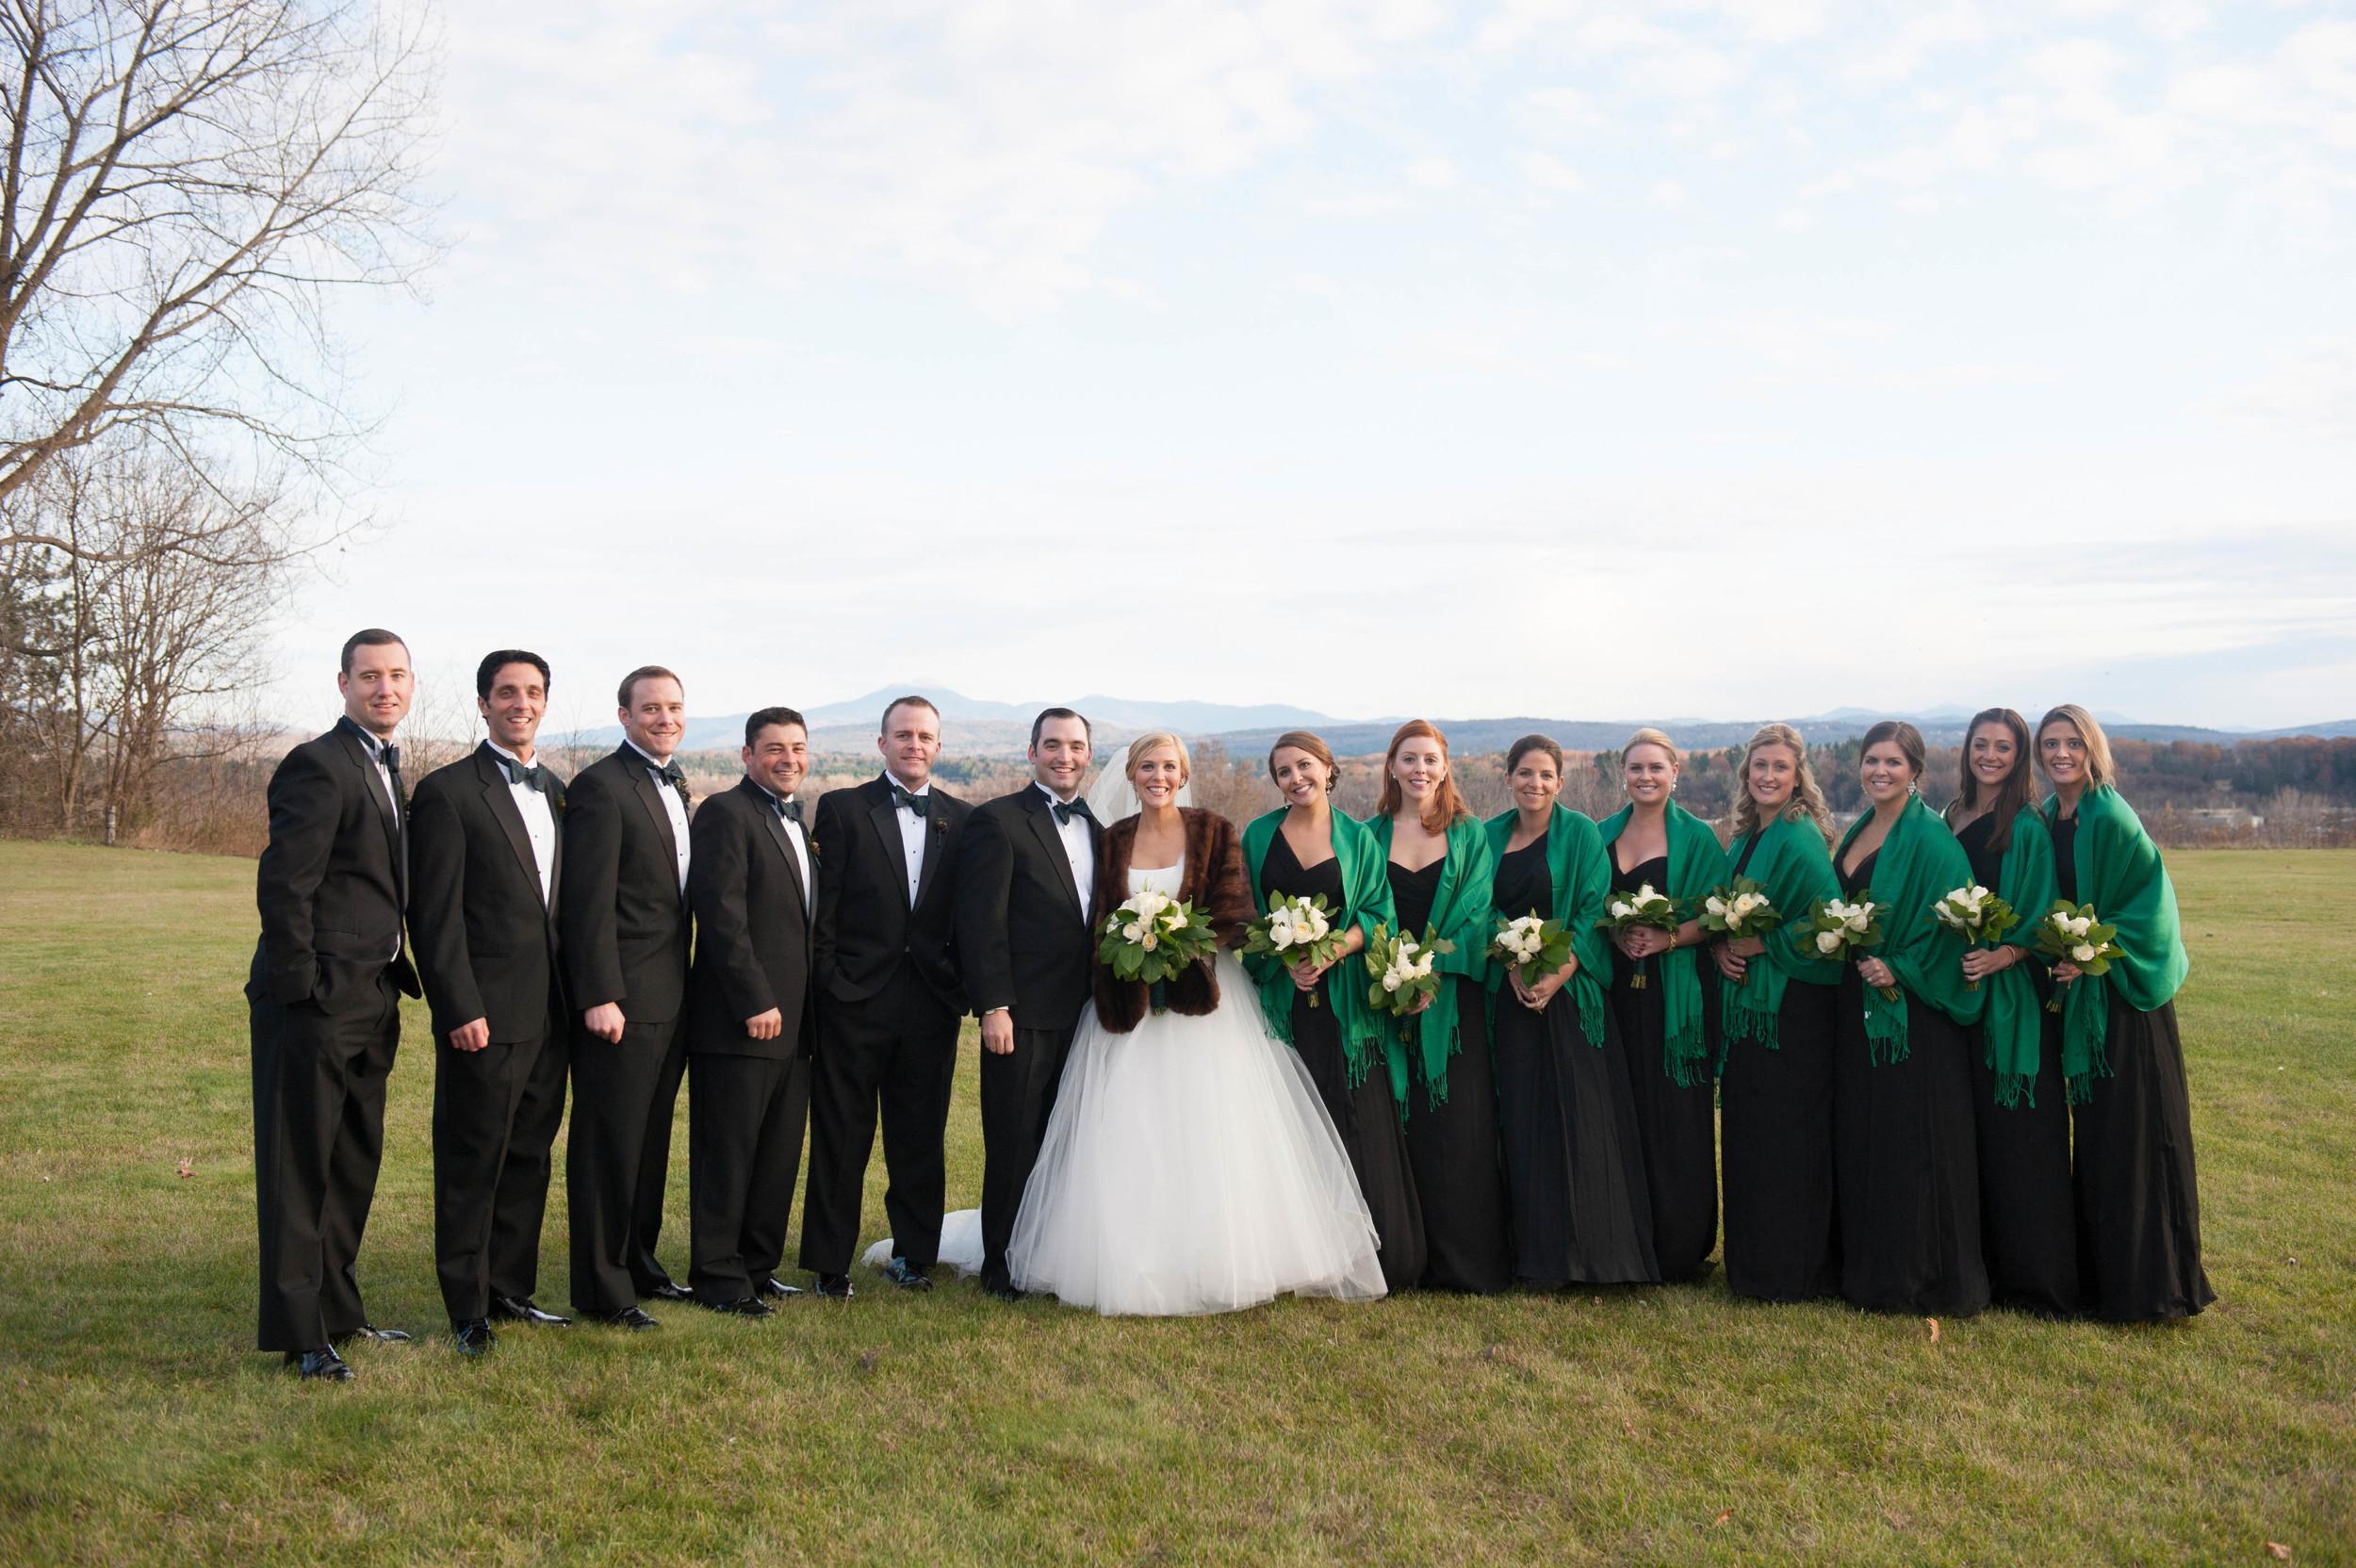 The_Ponds_Vermont_Wedding_Photo-75.jpg